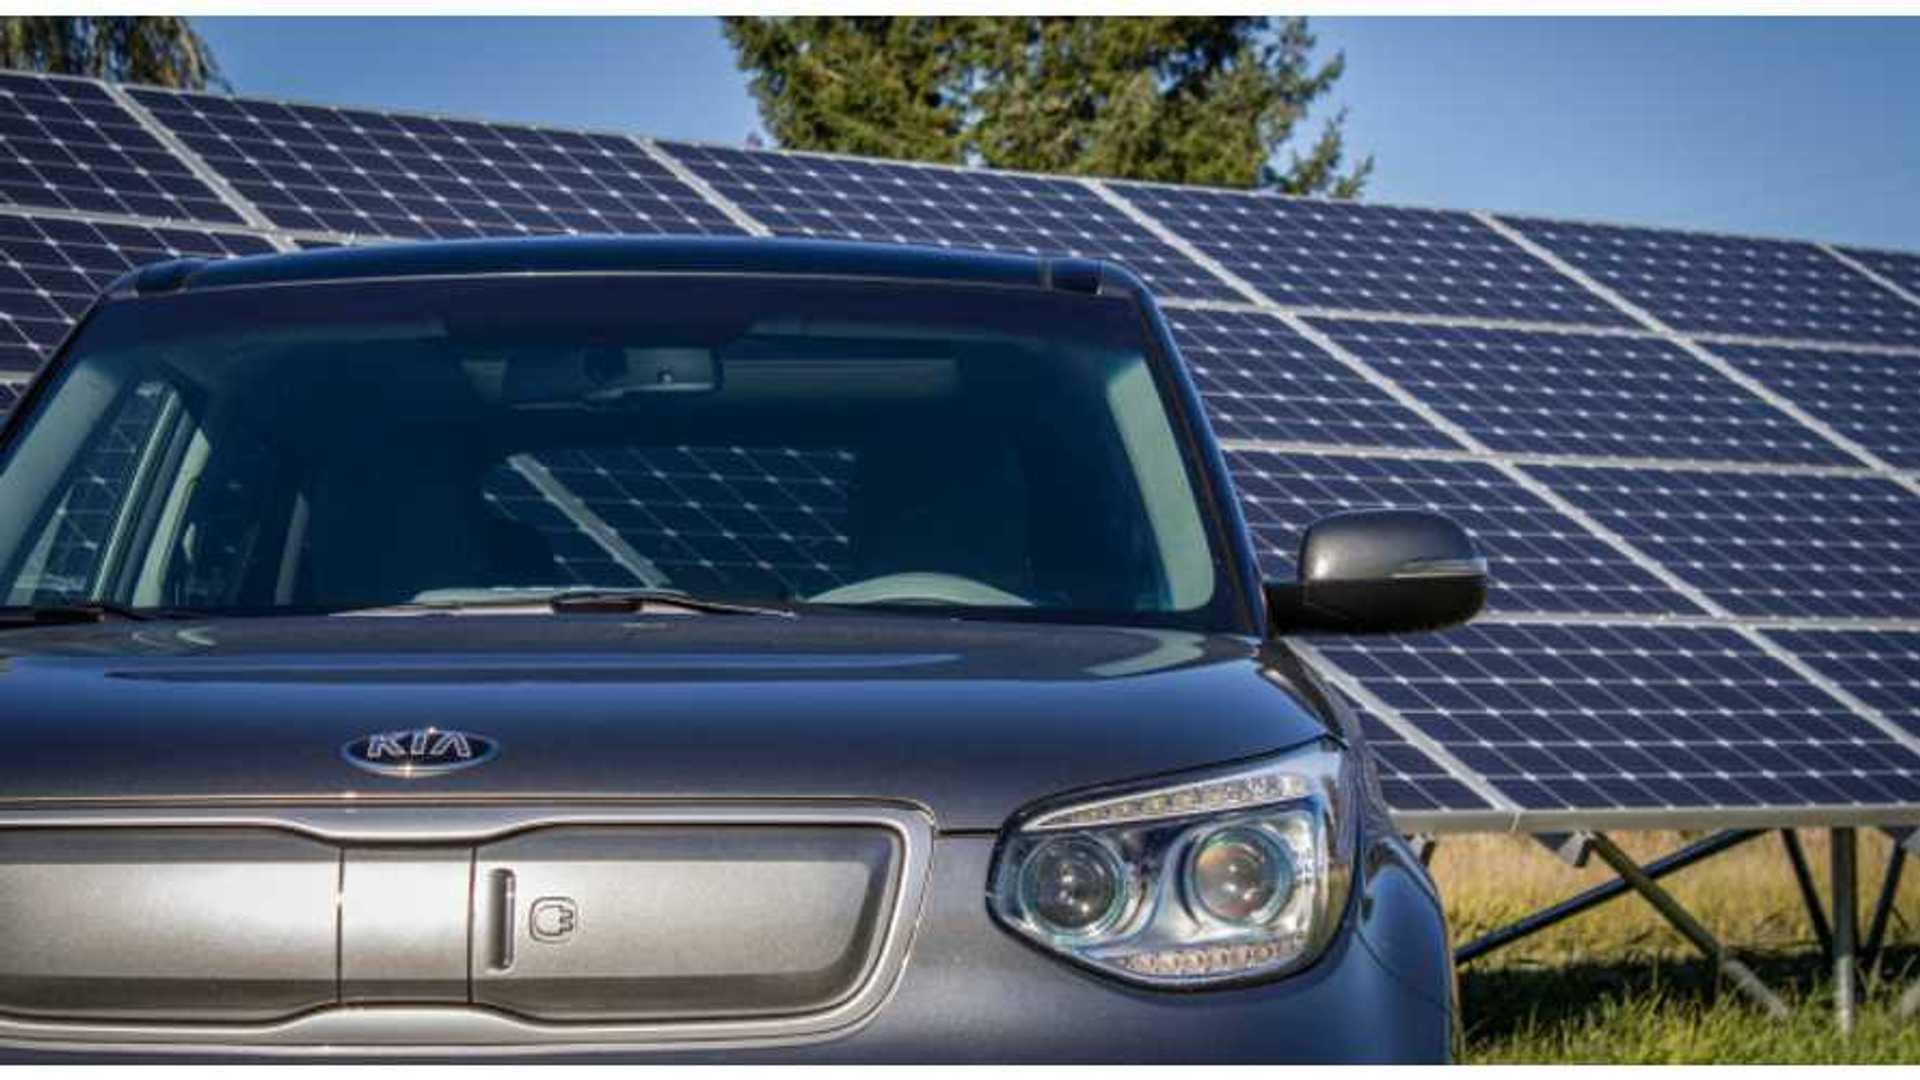 Kia Sportage Electrical Wiring Diagram Pdf Manual Autos Weblog